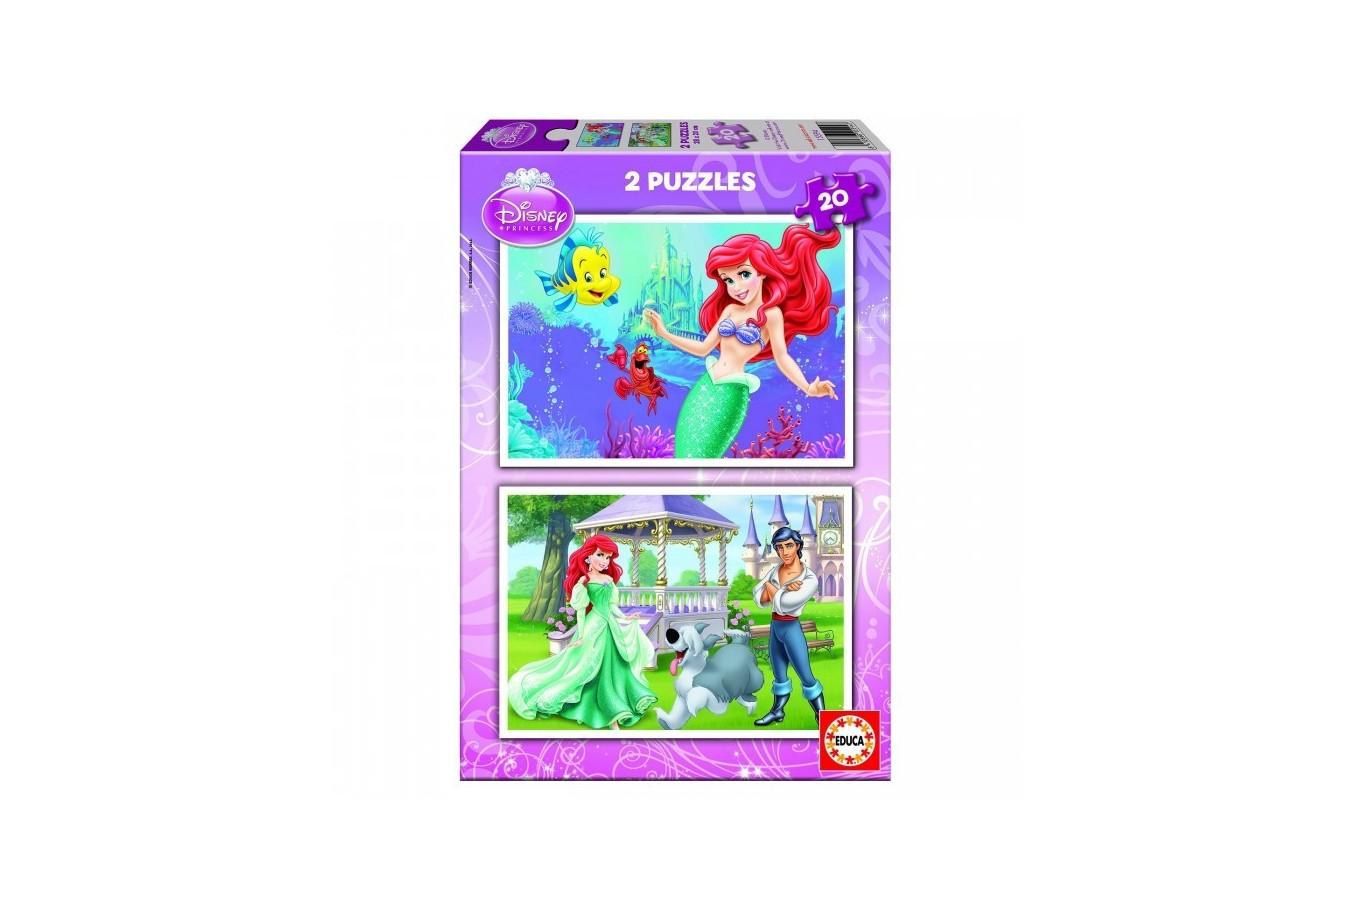 Puzzle Educa - Disney Princess: Ariel the Little Mermaid, 2x20 piese (15594)